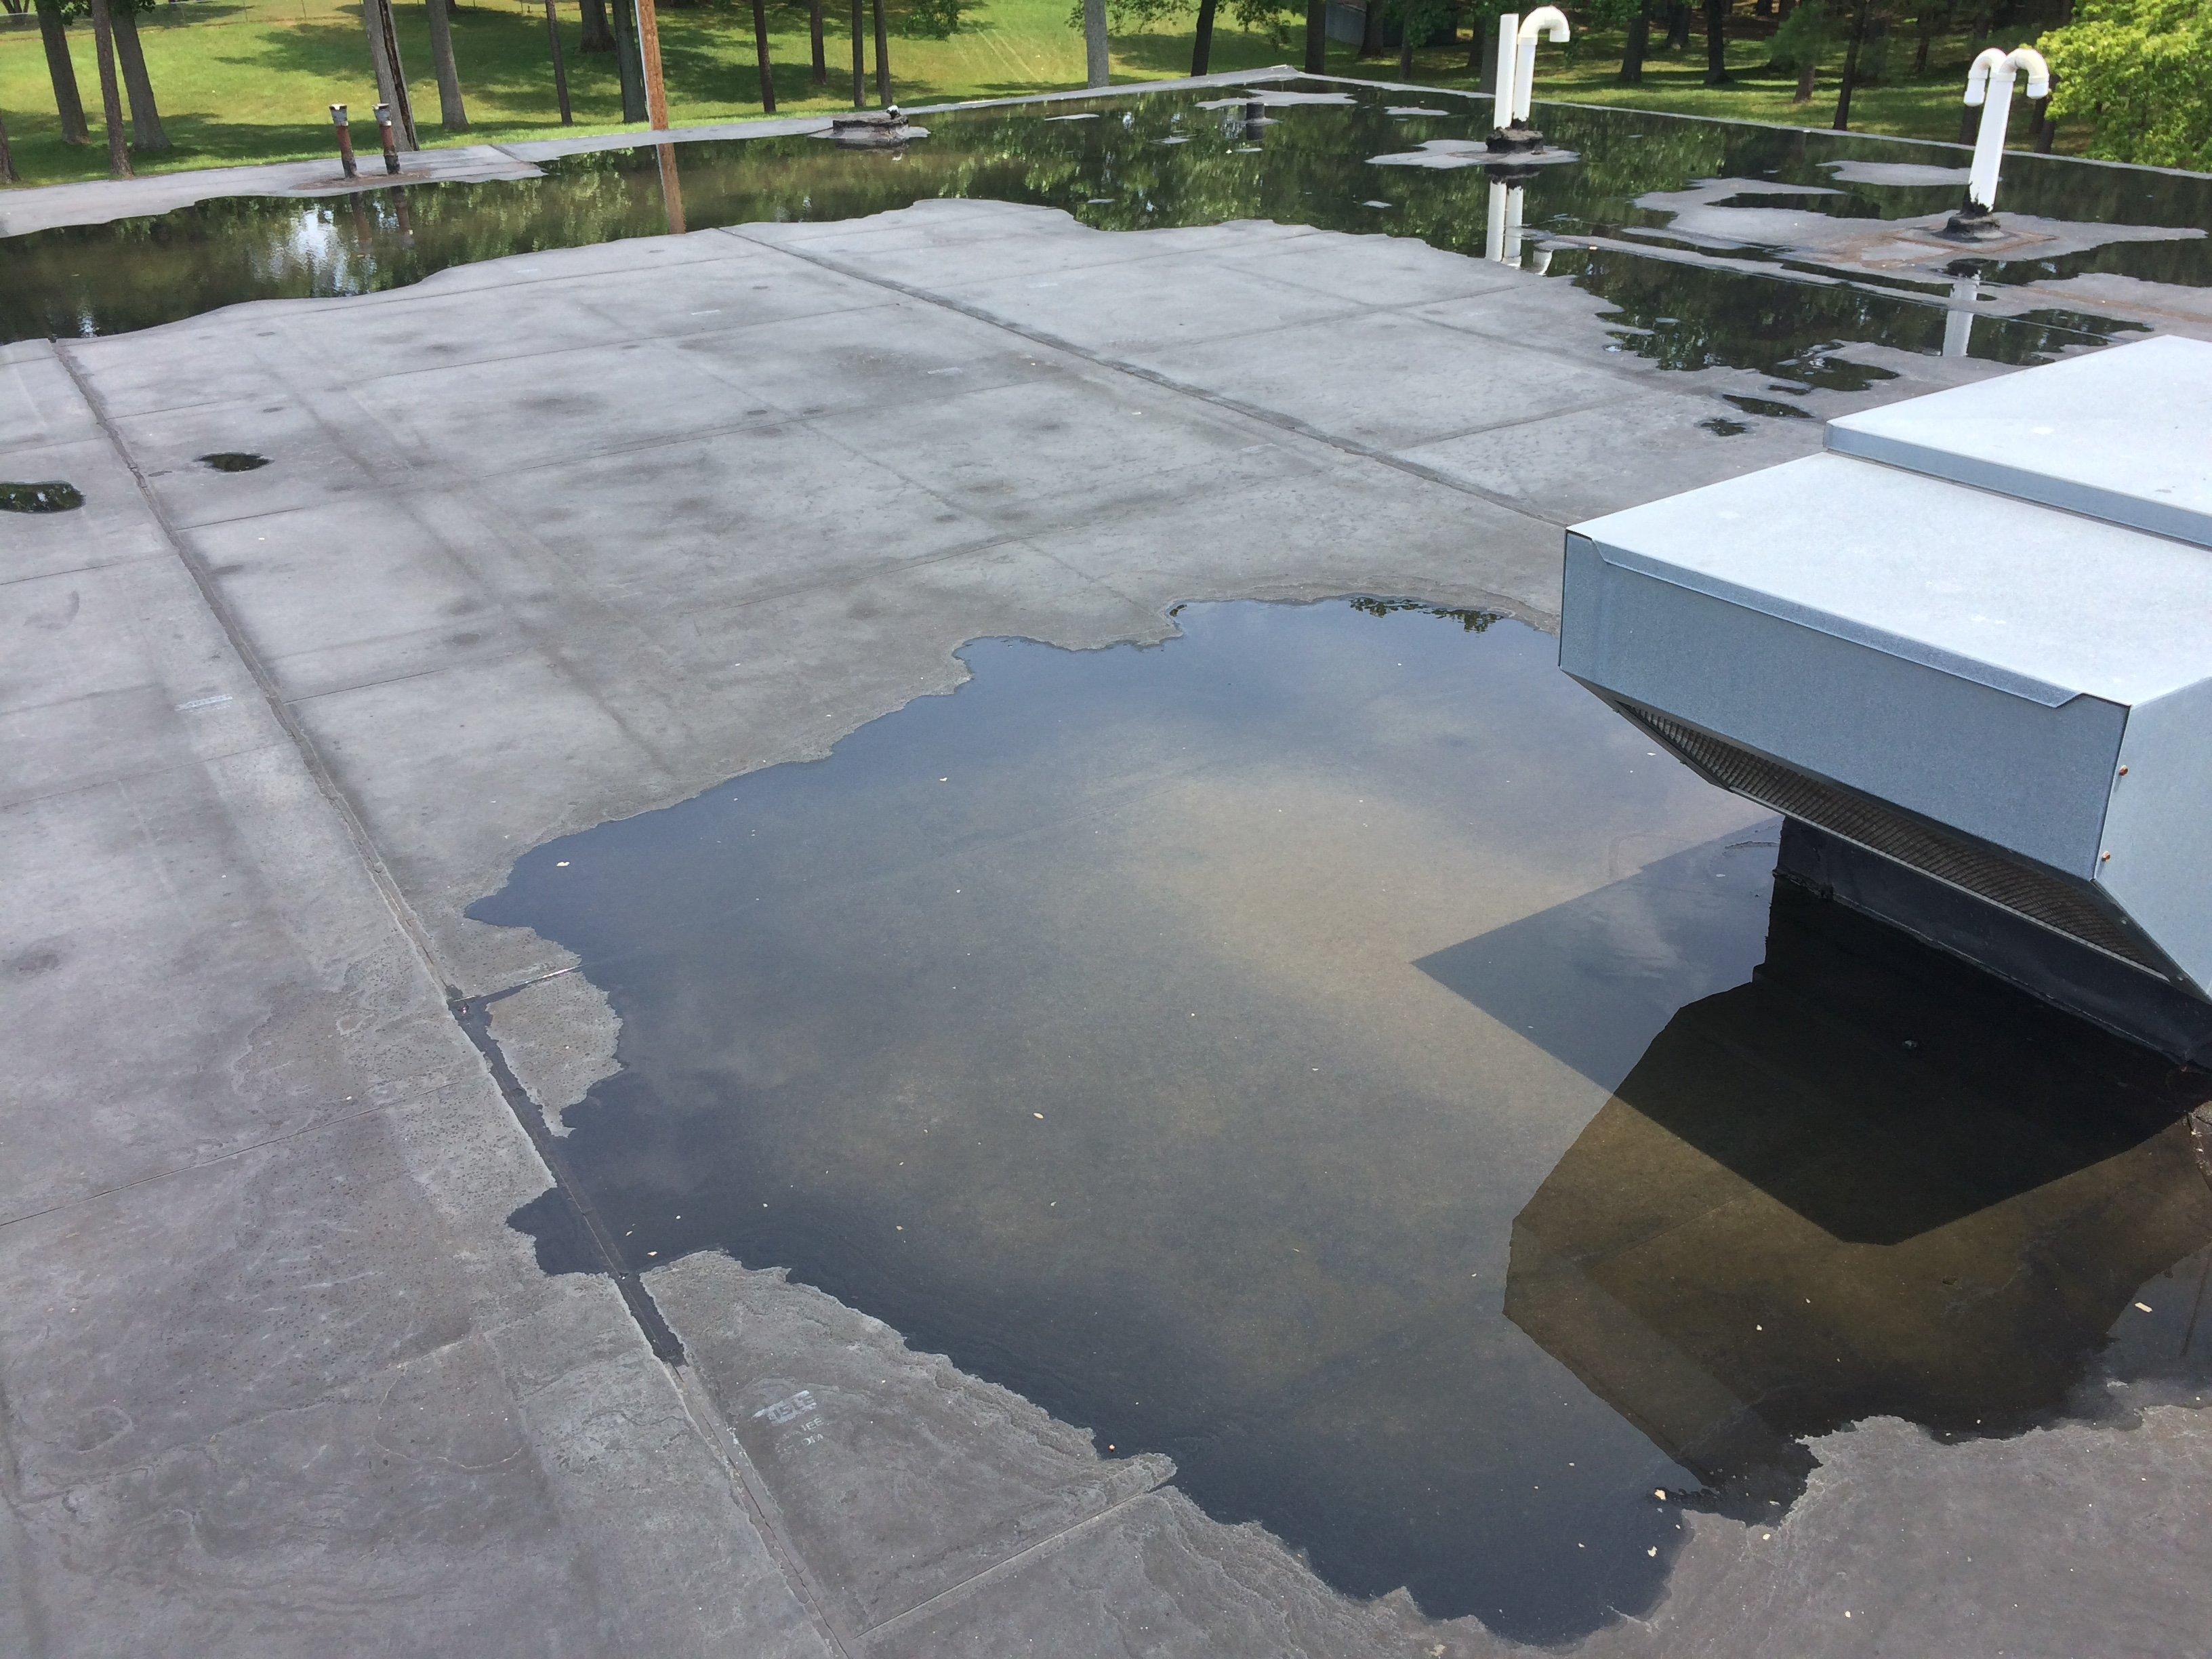 Commercial Roofing Company Lynchburg, VA